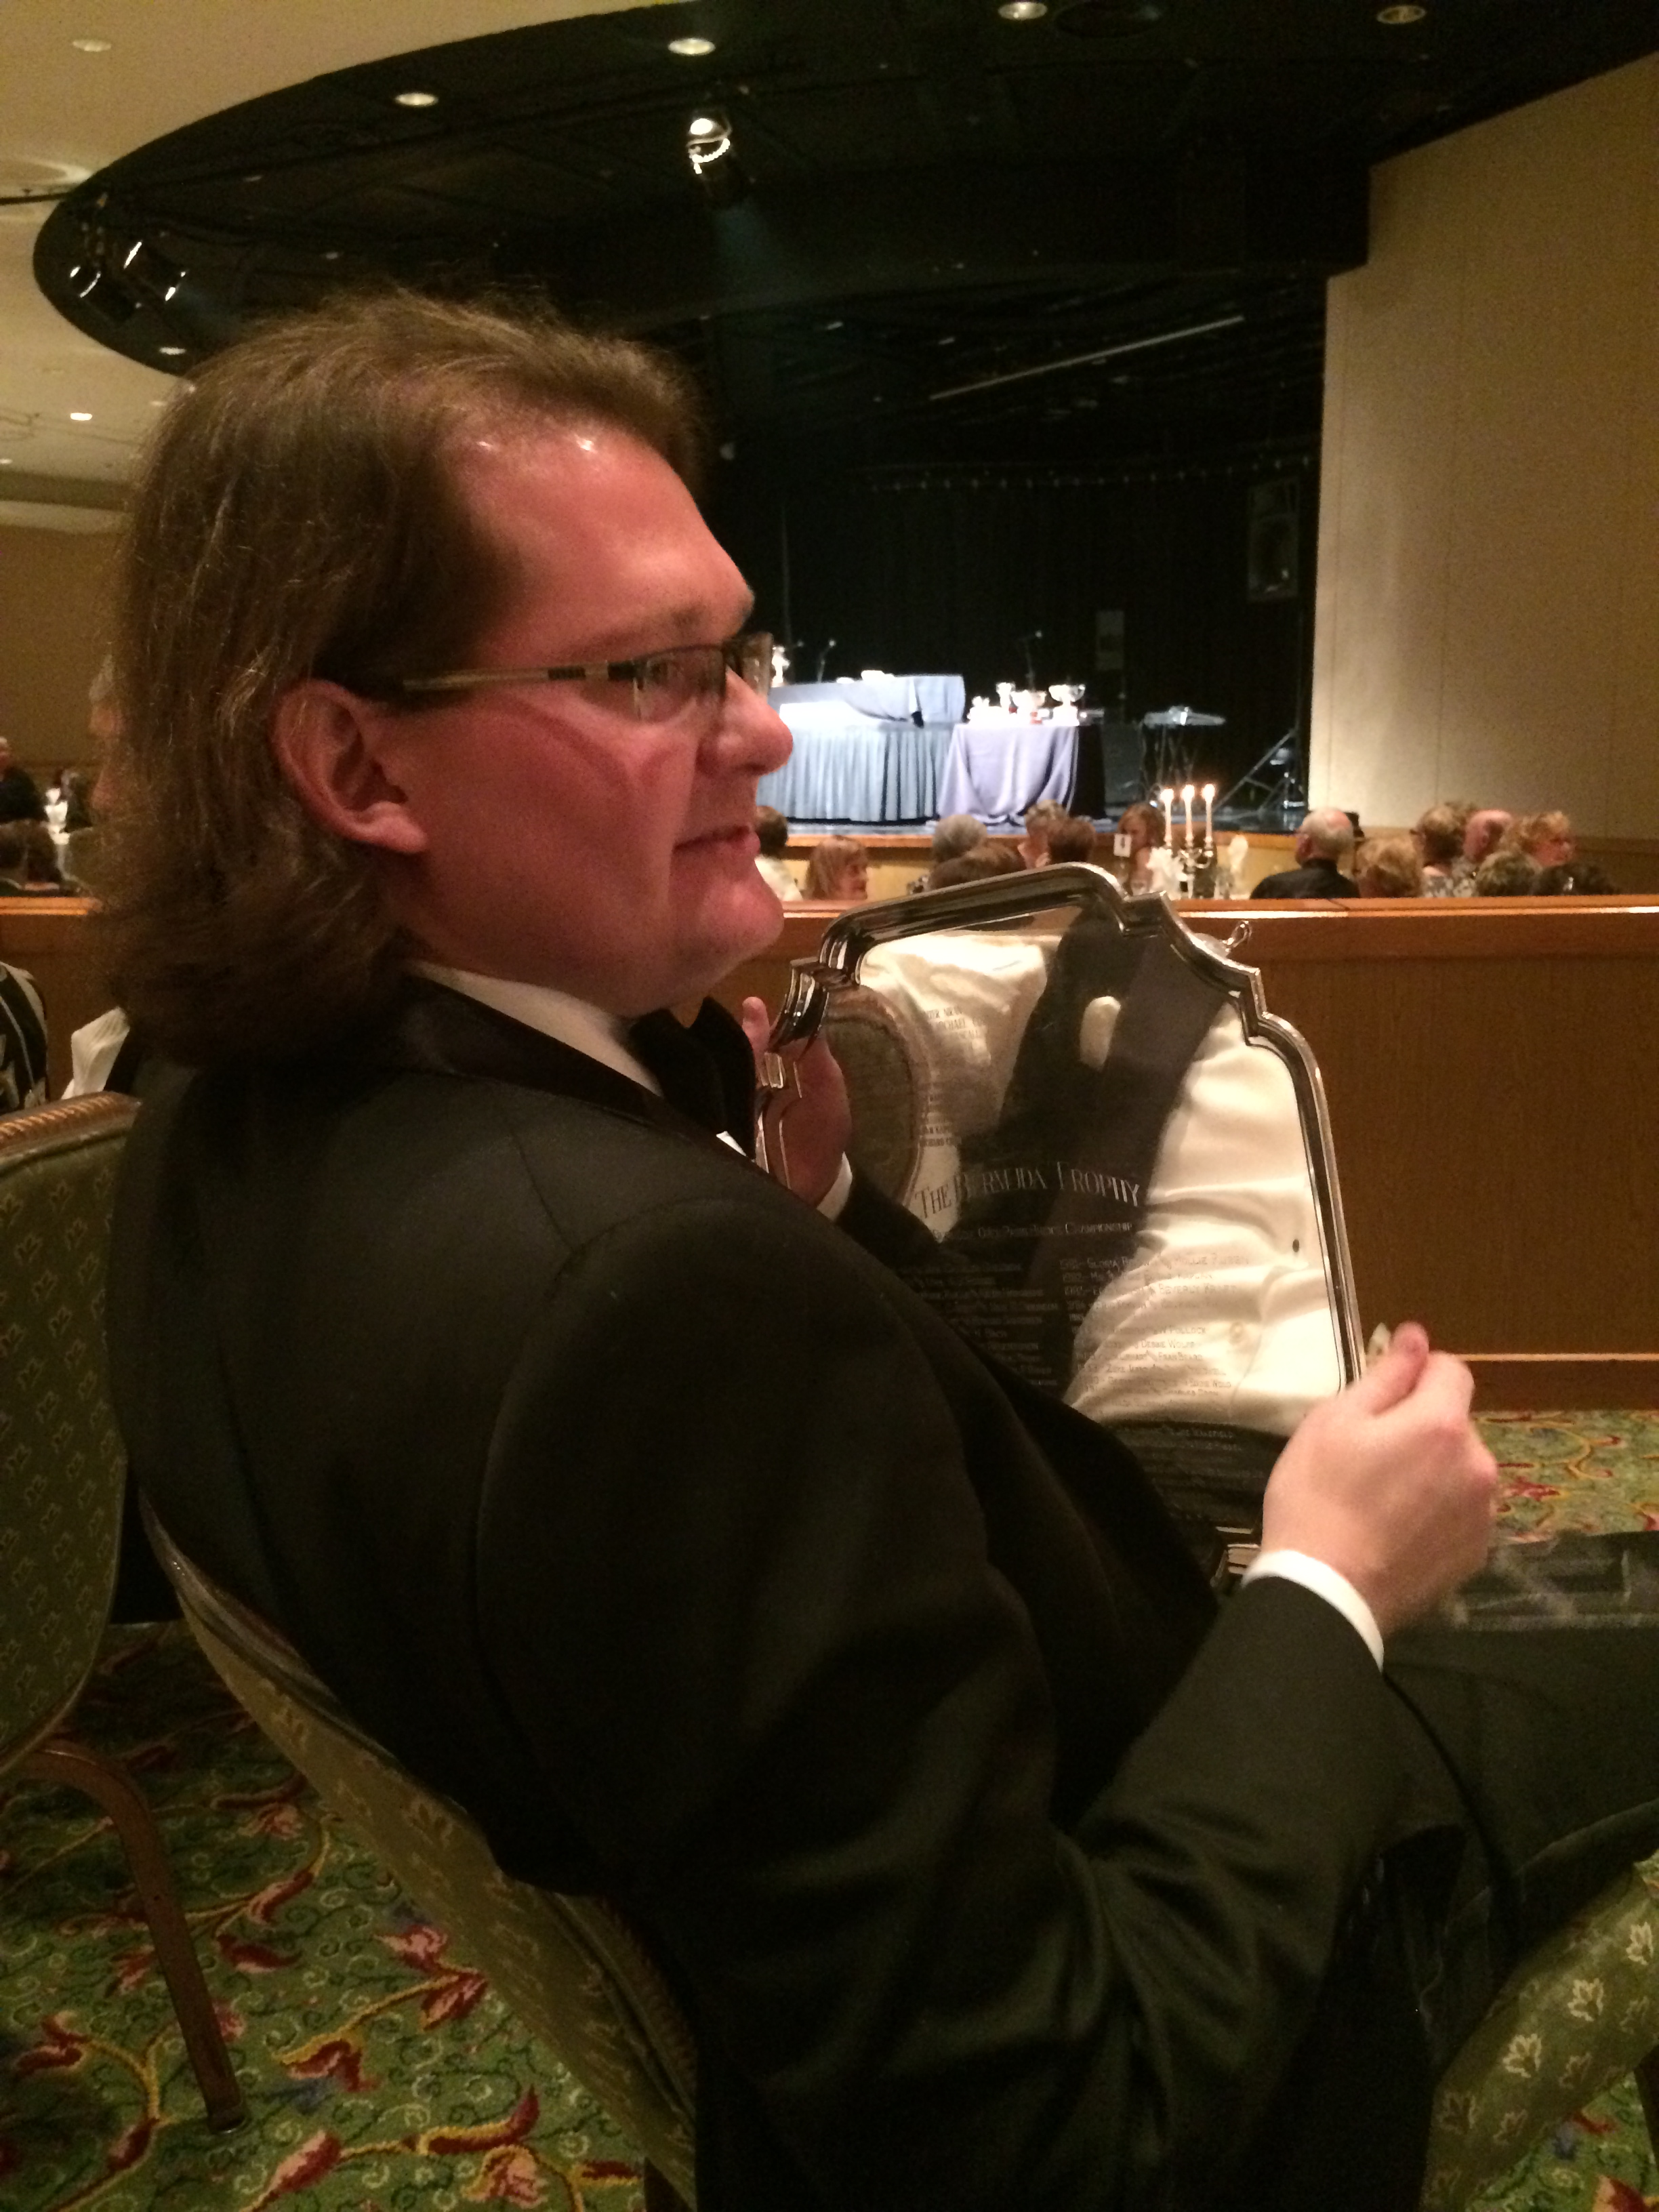 Robert contemplates his trophy, Bermuda